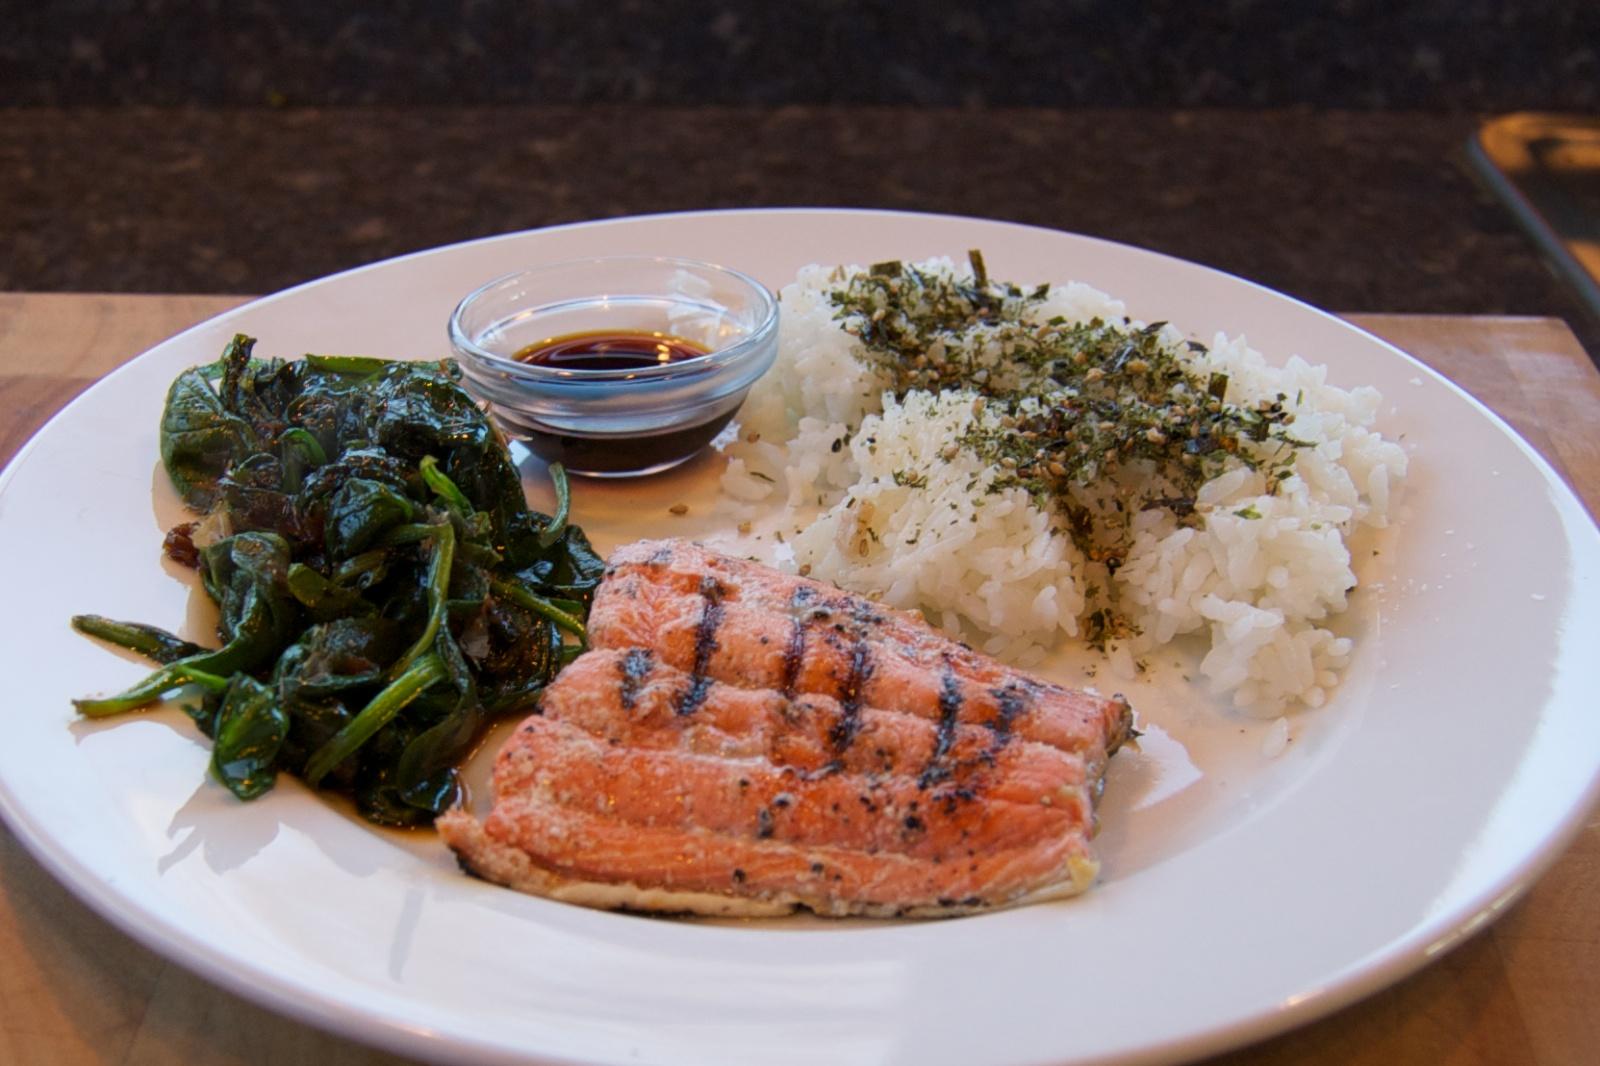 http://blog.rickk.com/food/2012/01/30/ate.2012.01.30.d.jpg